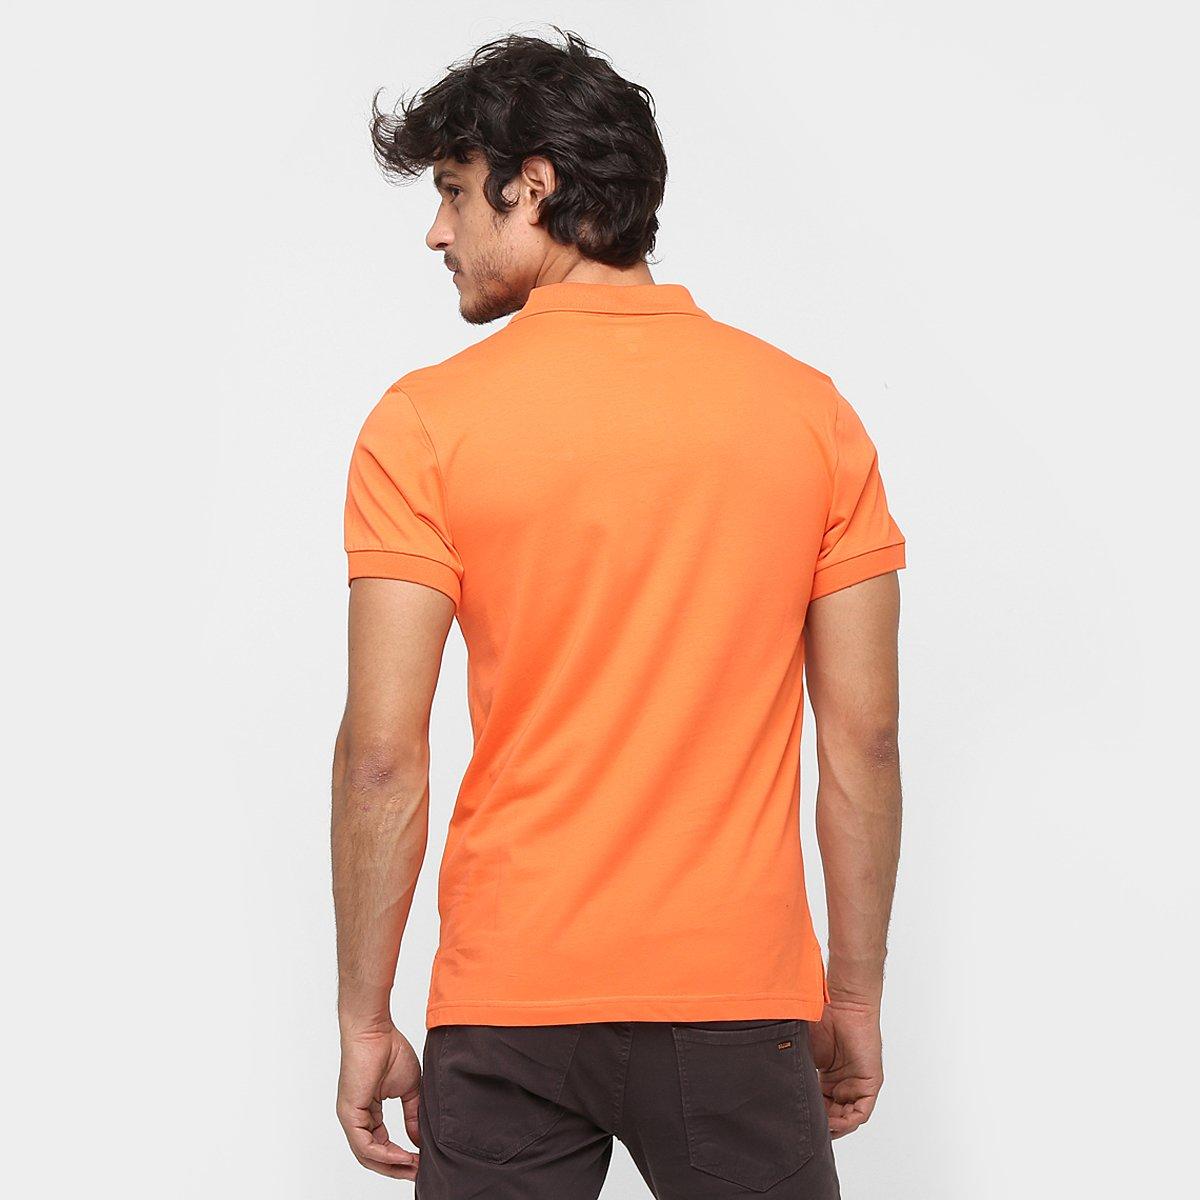 b466079631 Camisa Polo Nike  Camisa Polo Nike ...